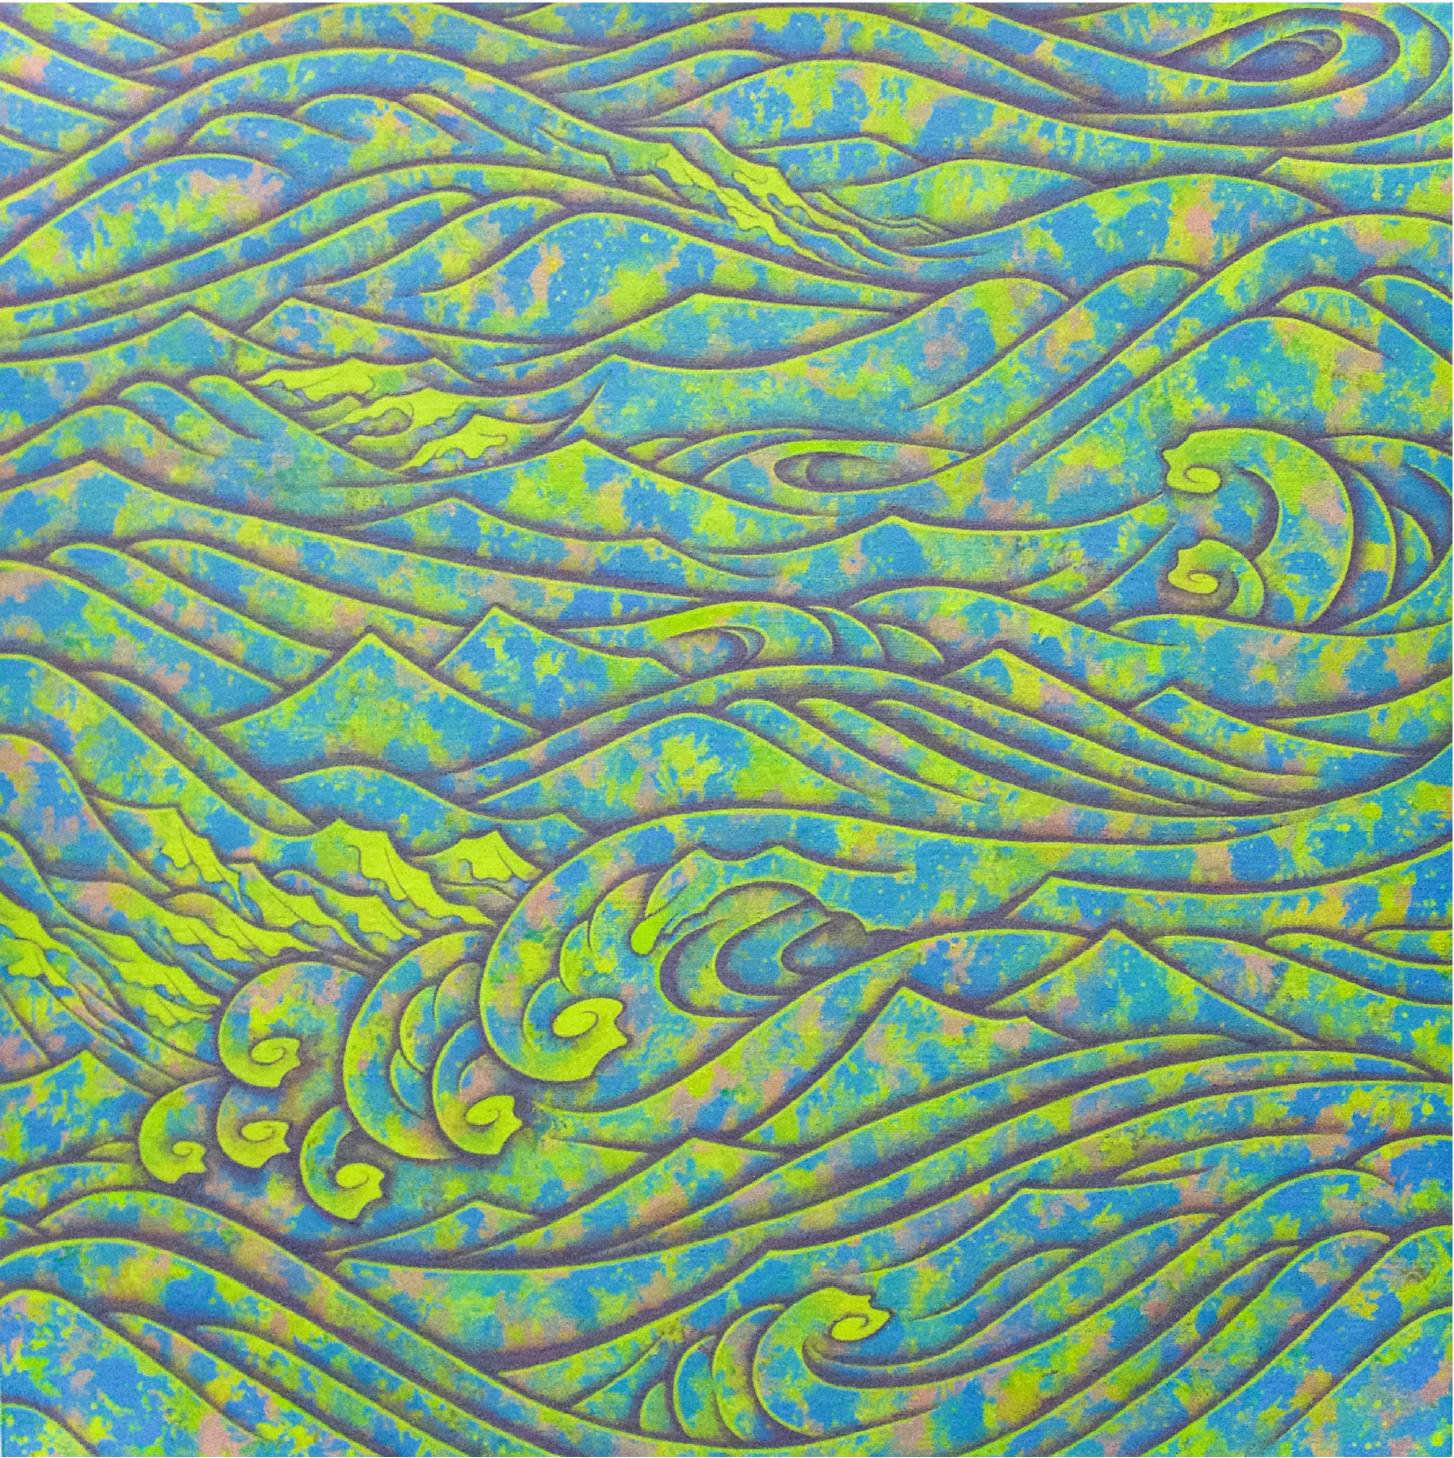 - Herakleiotos 072018Acrylic on canvas16 1/4 x 16 1/4 inches